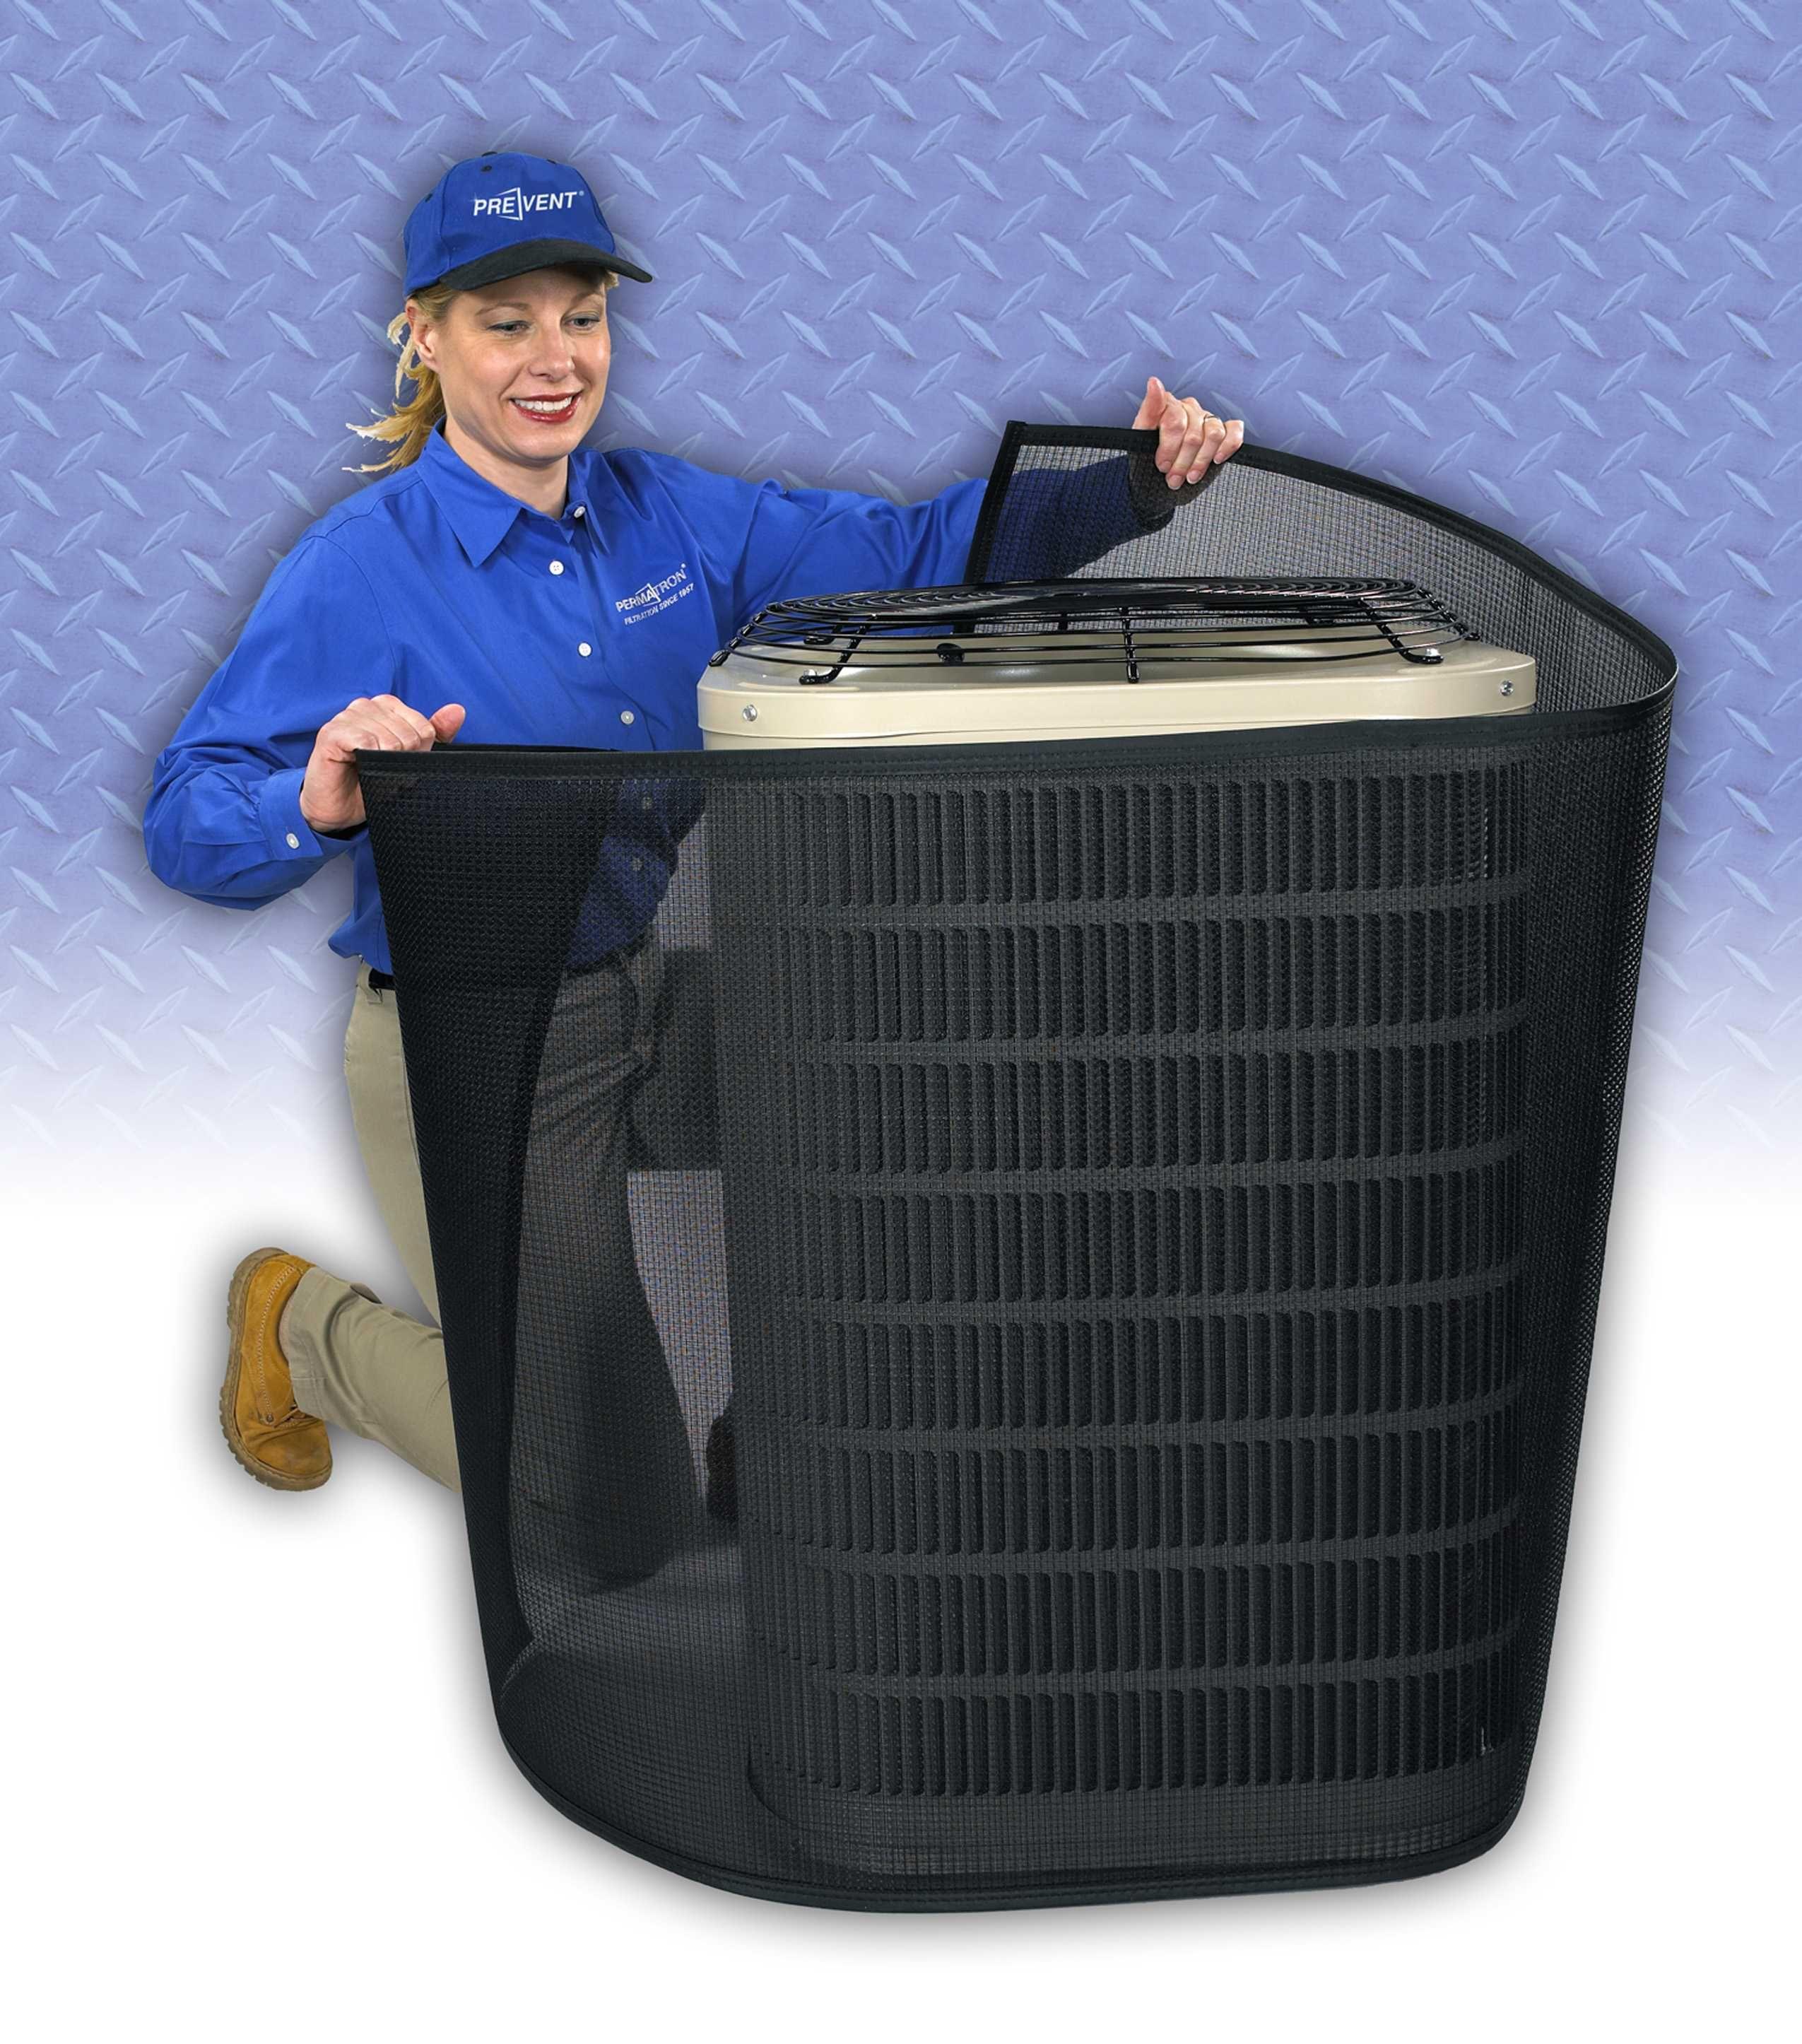 Condenser Coil Filter PreVent Wrap Around Home